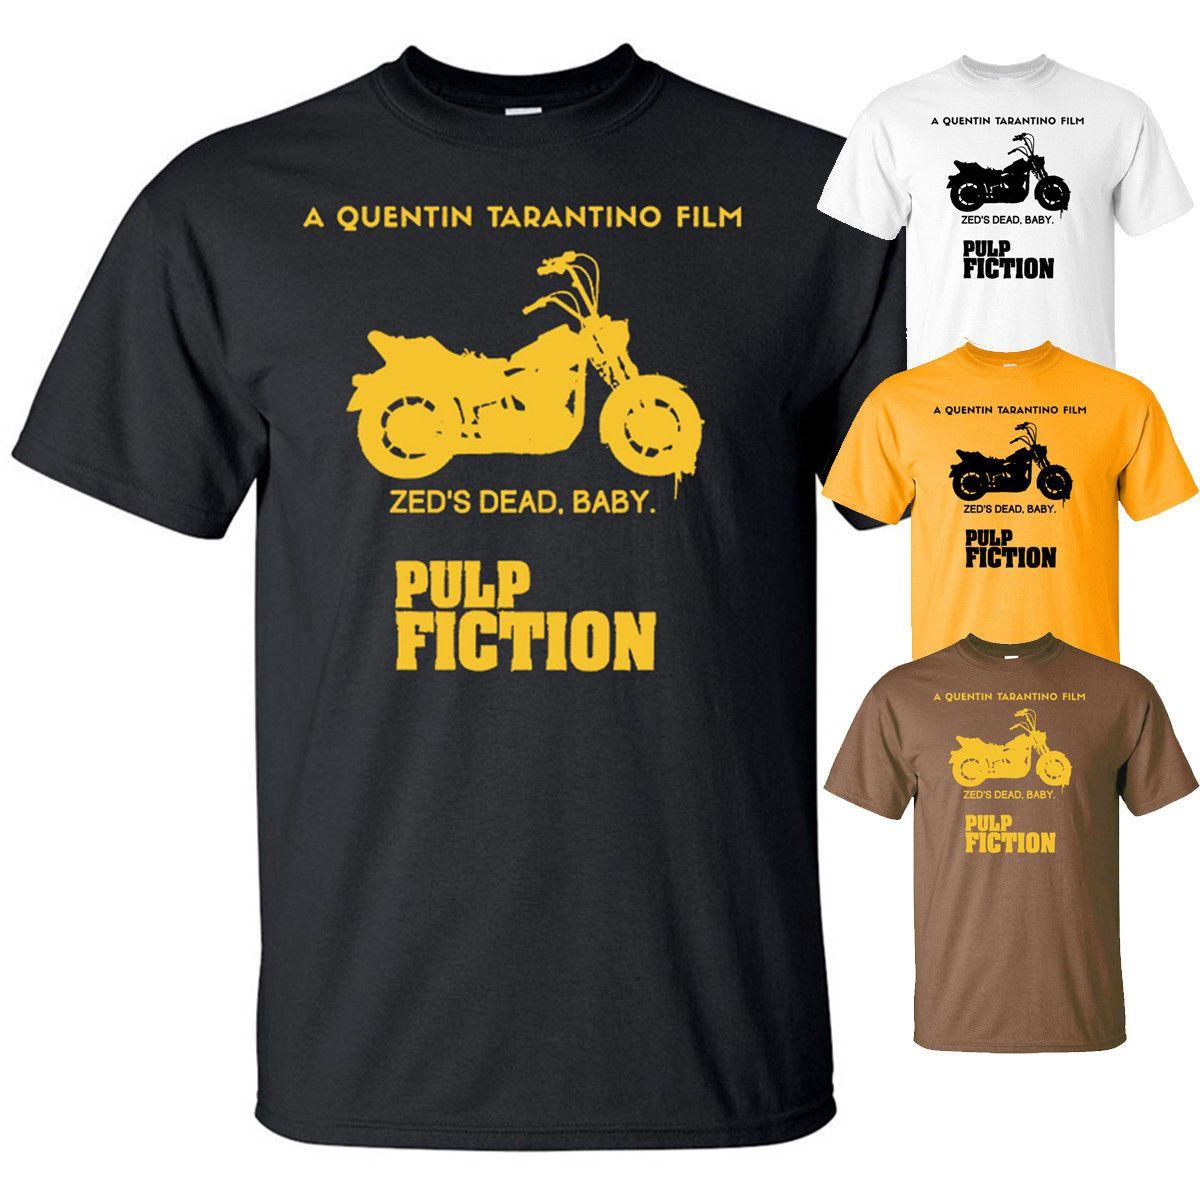 Pulp Fiction v4, John Travolta,Ving Rhame ,movie poster, T-Shirt All sizes  S-3XL